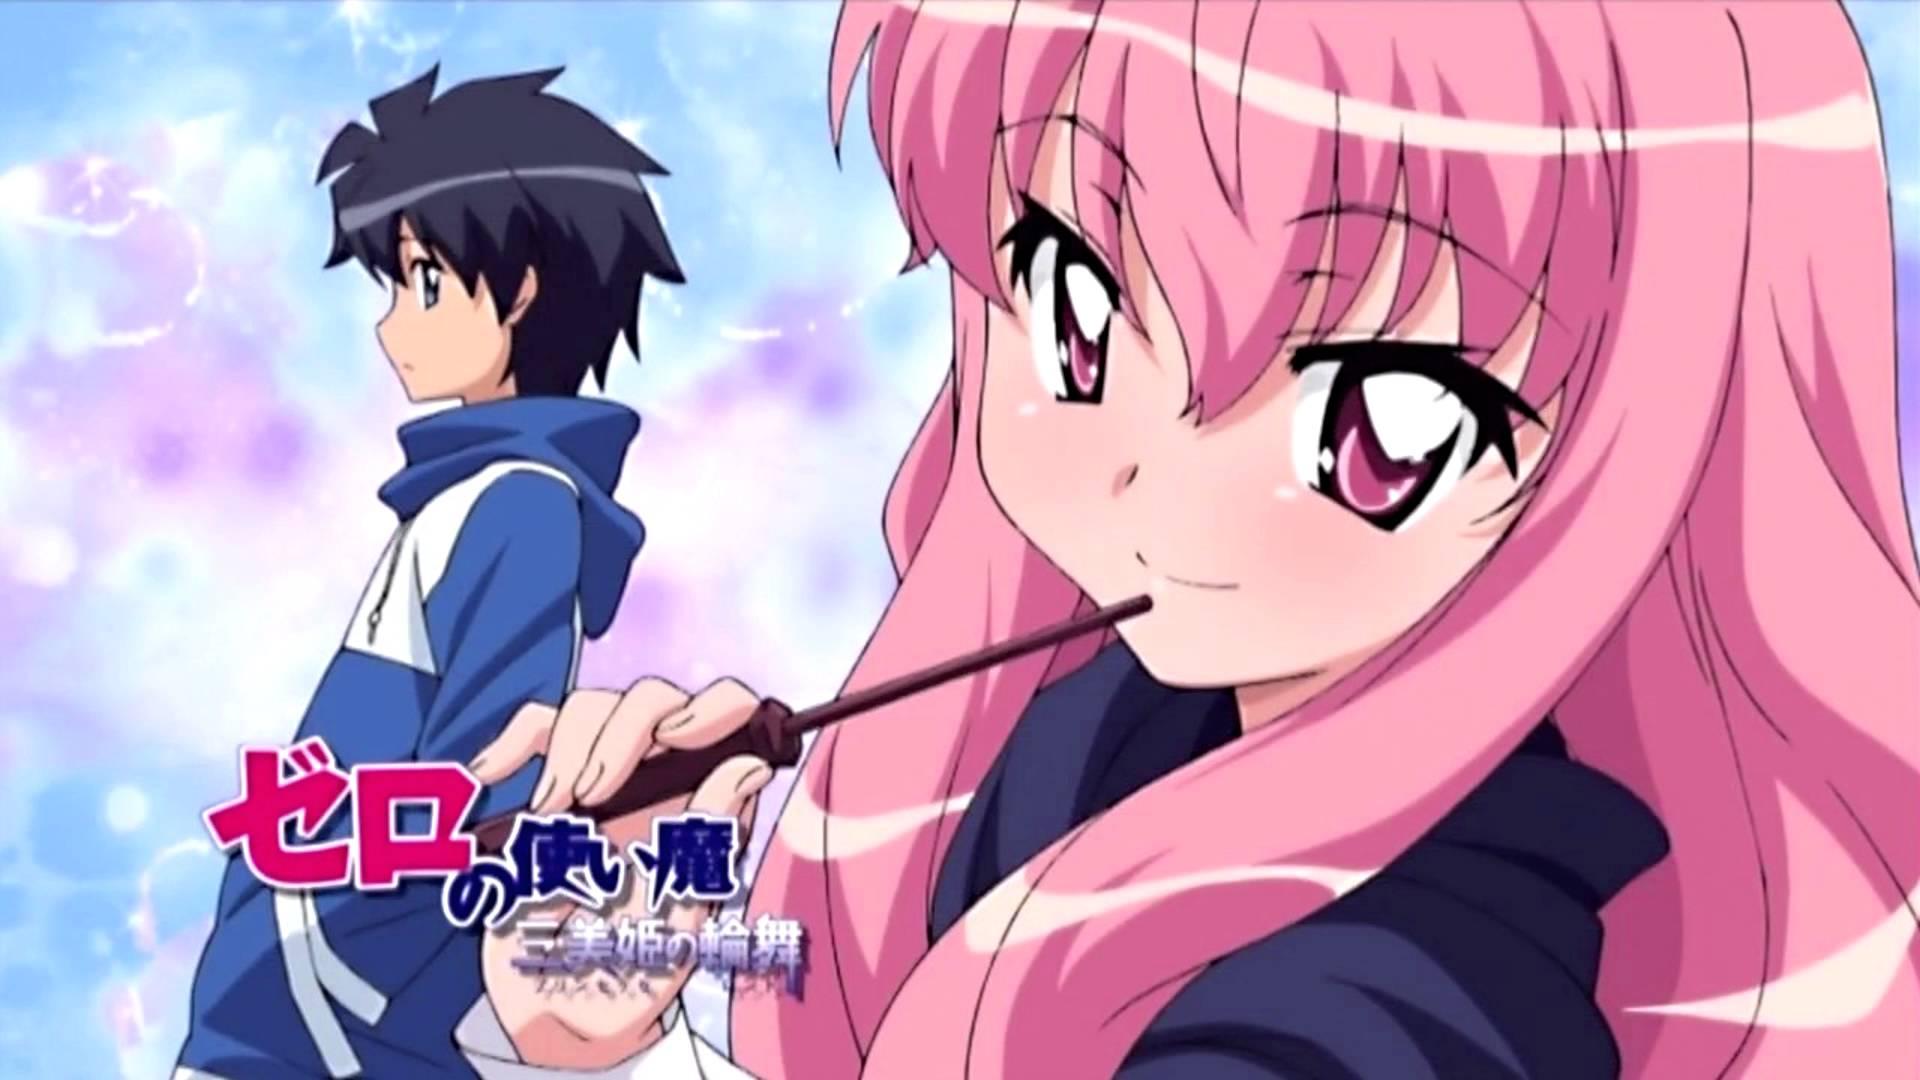 Zero no Tsukaima Season 2 Sub indo BD 1 - 12(END)